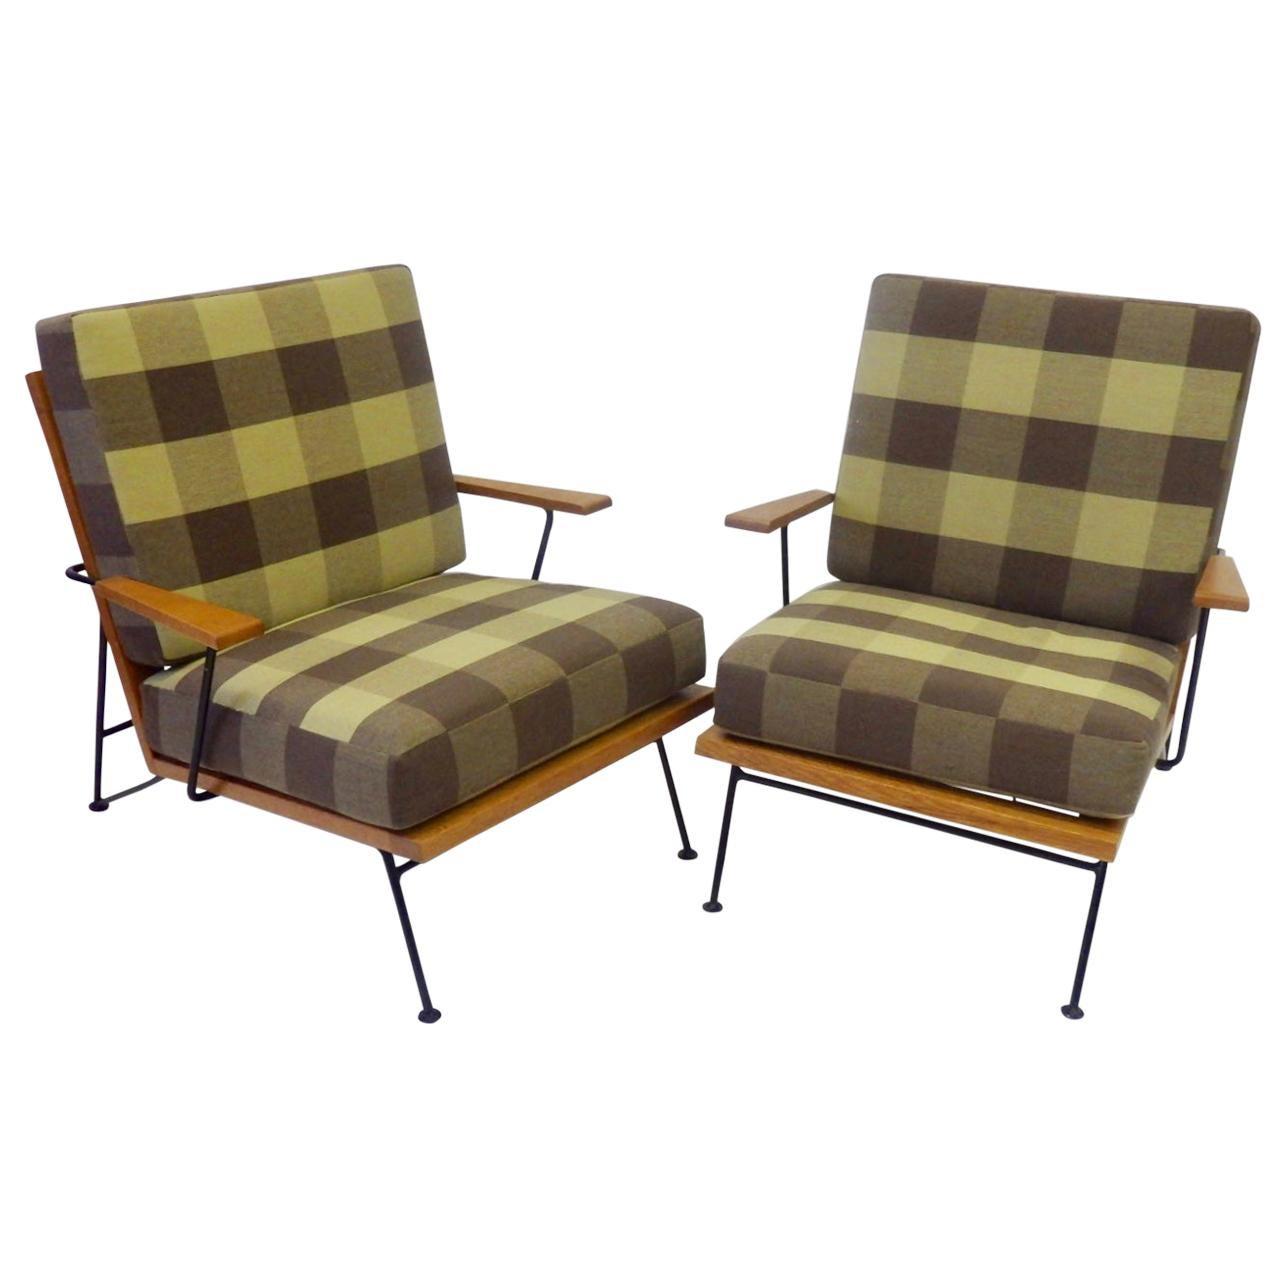 Pair of Pipsan Saarinen Robert Swanson Wood on Wrought Iron Frame Lounge Chairs